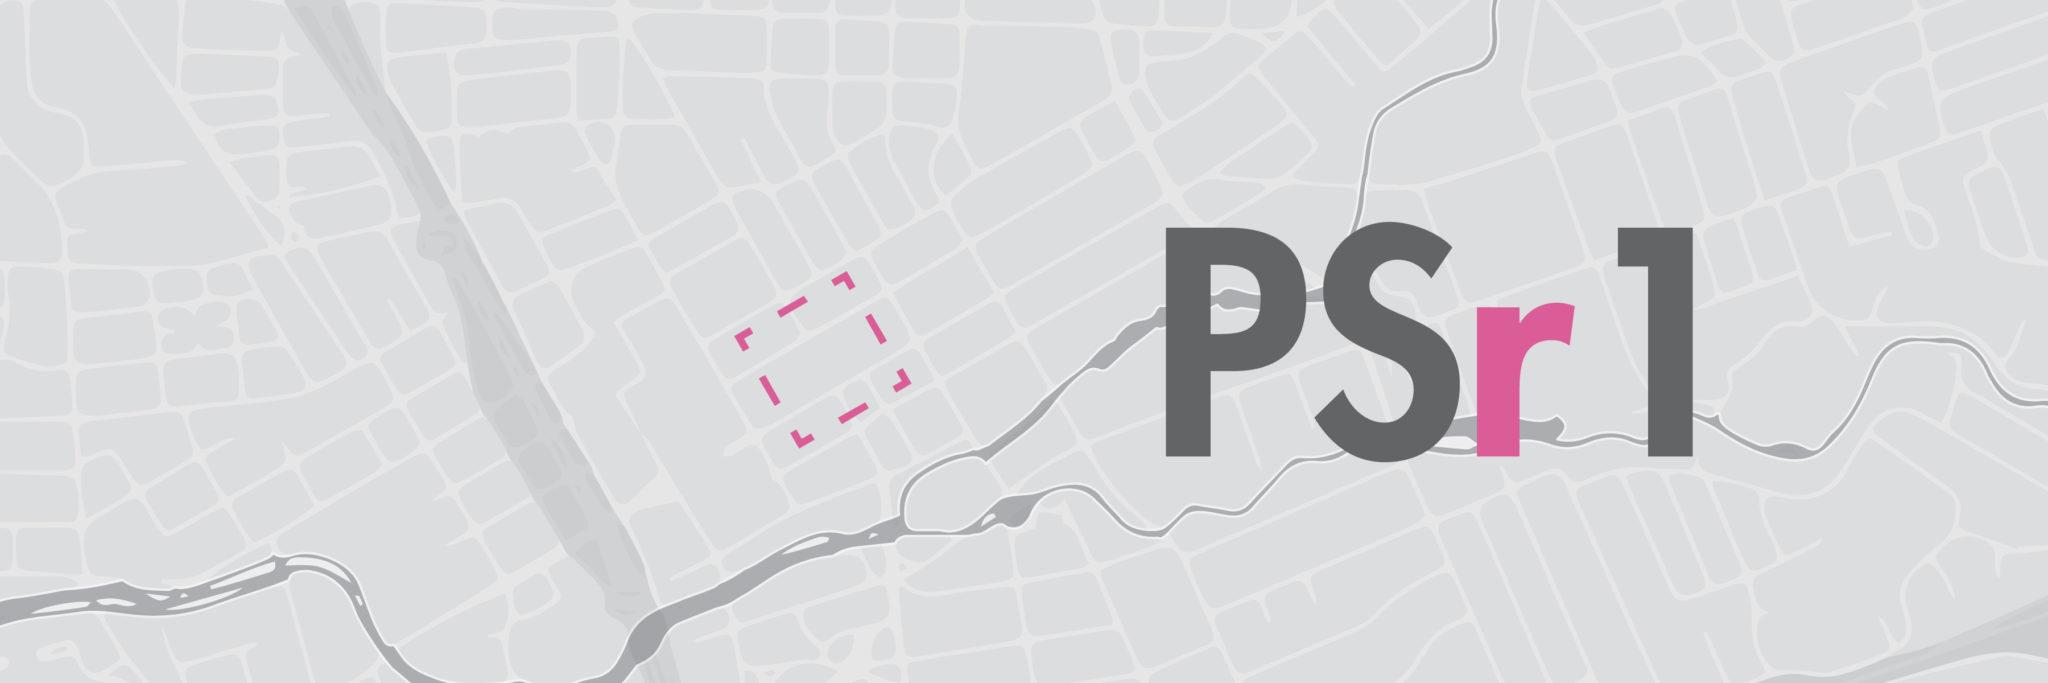 PSr1 Banner